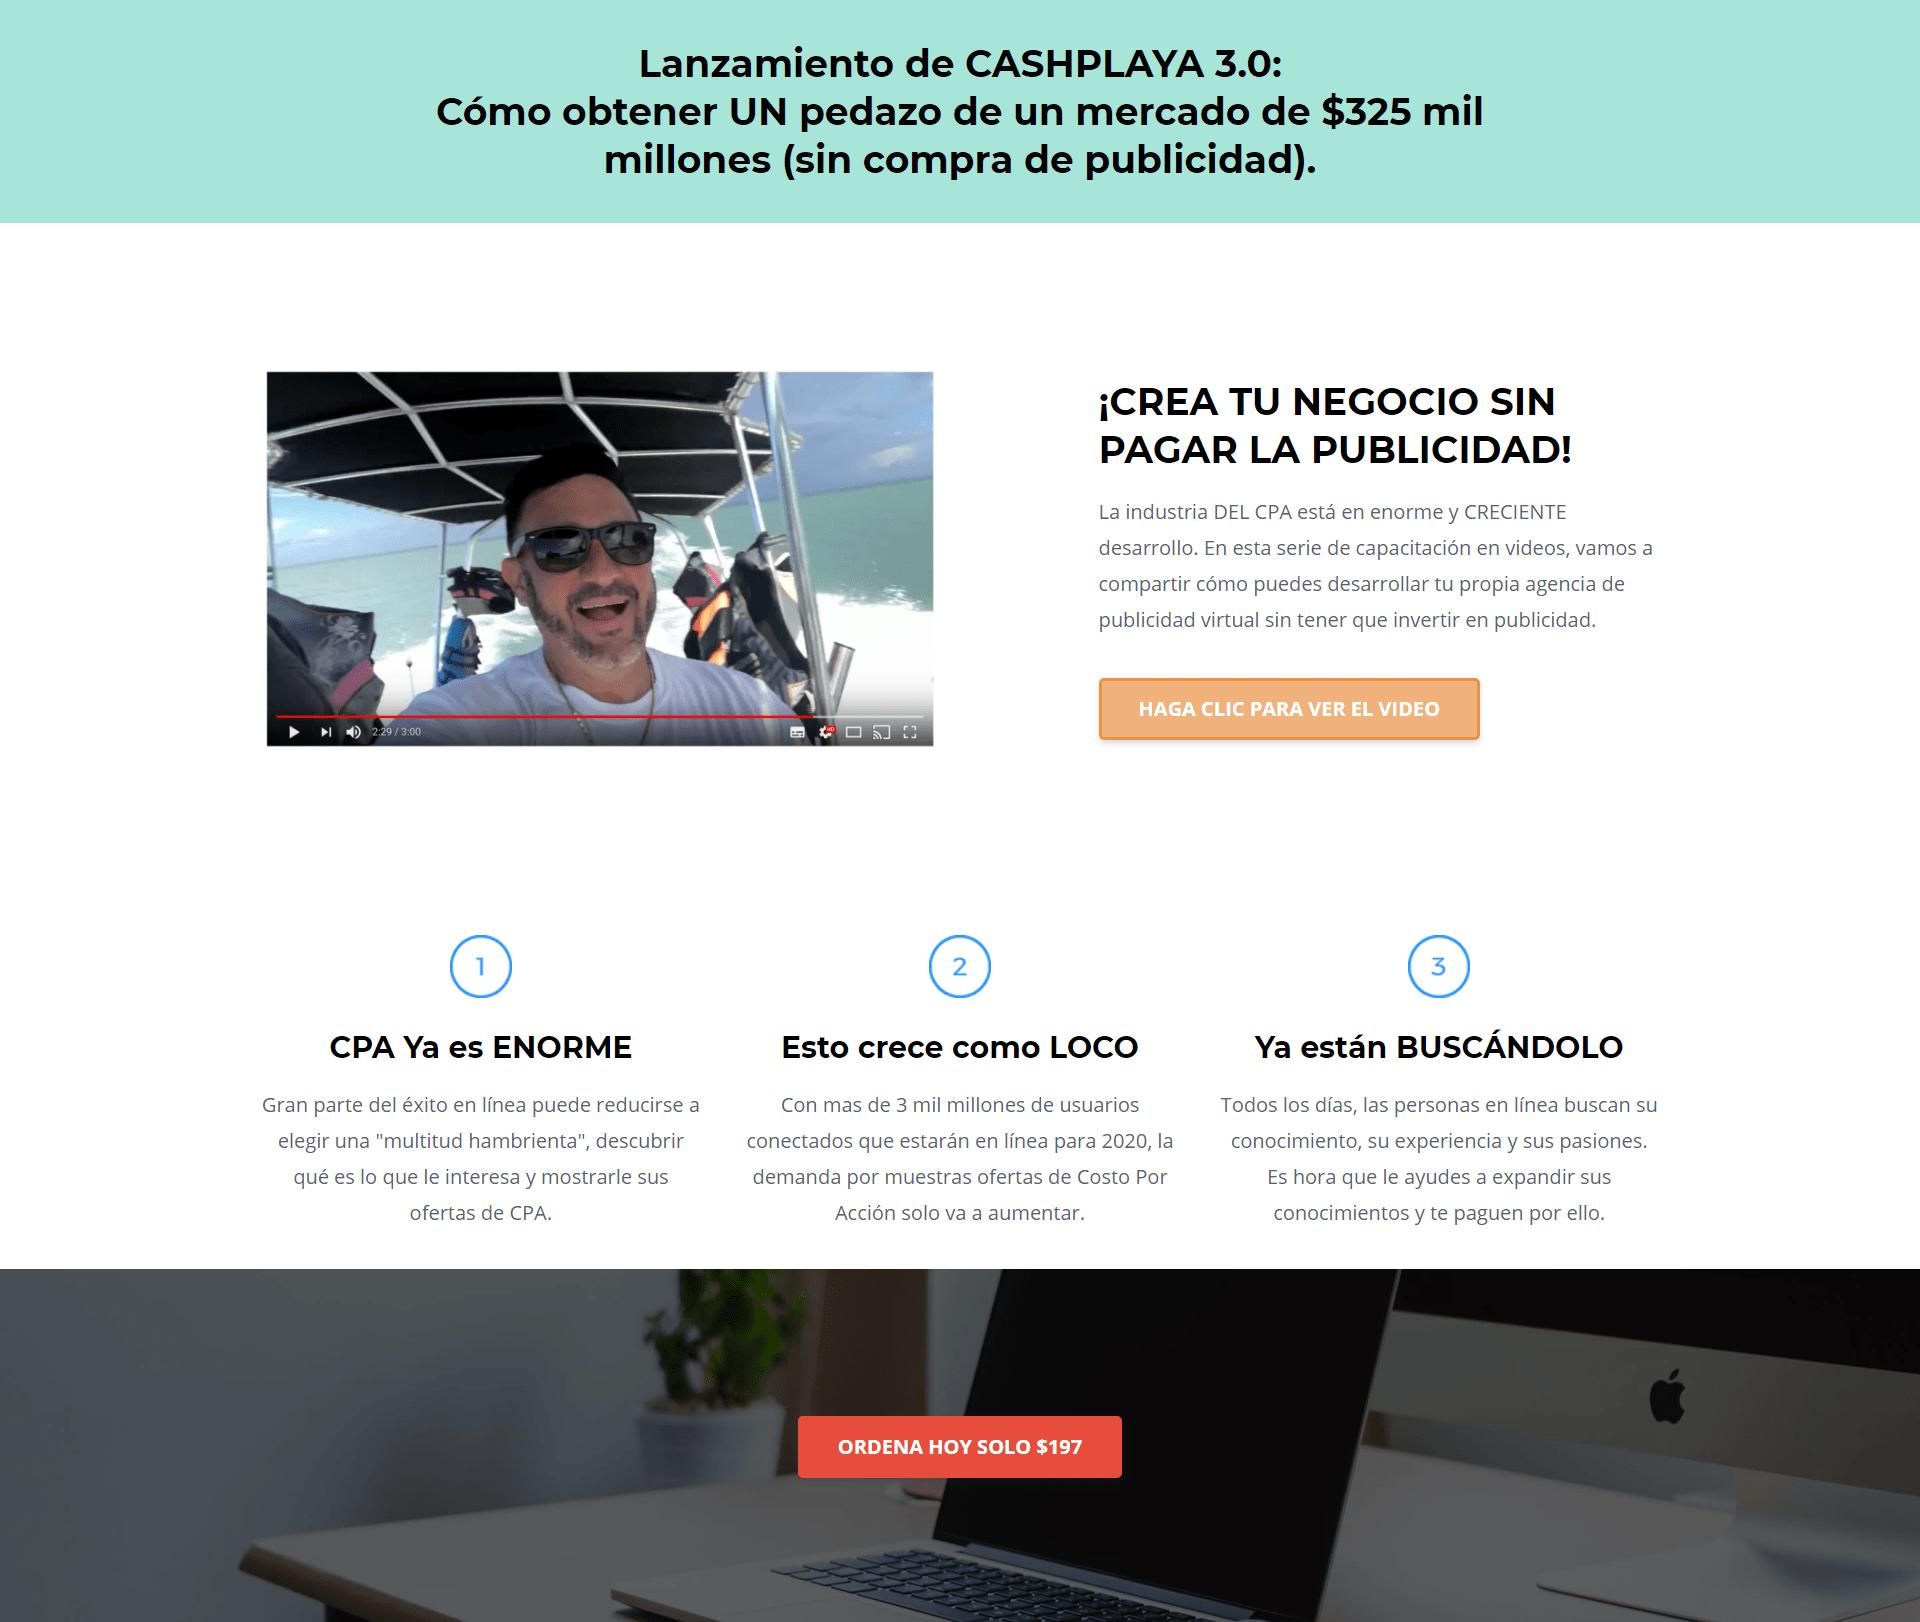 Cash Playa 3.0